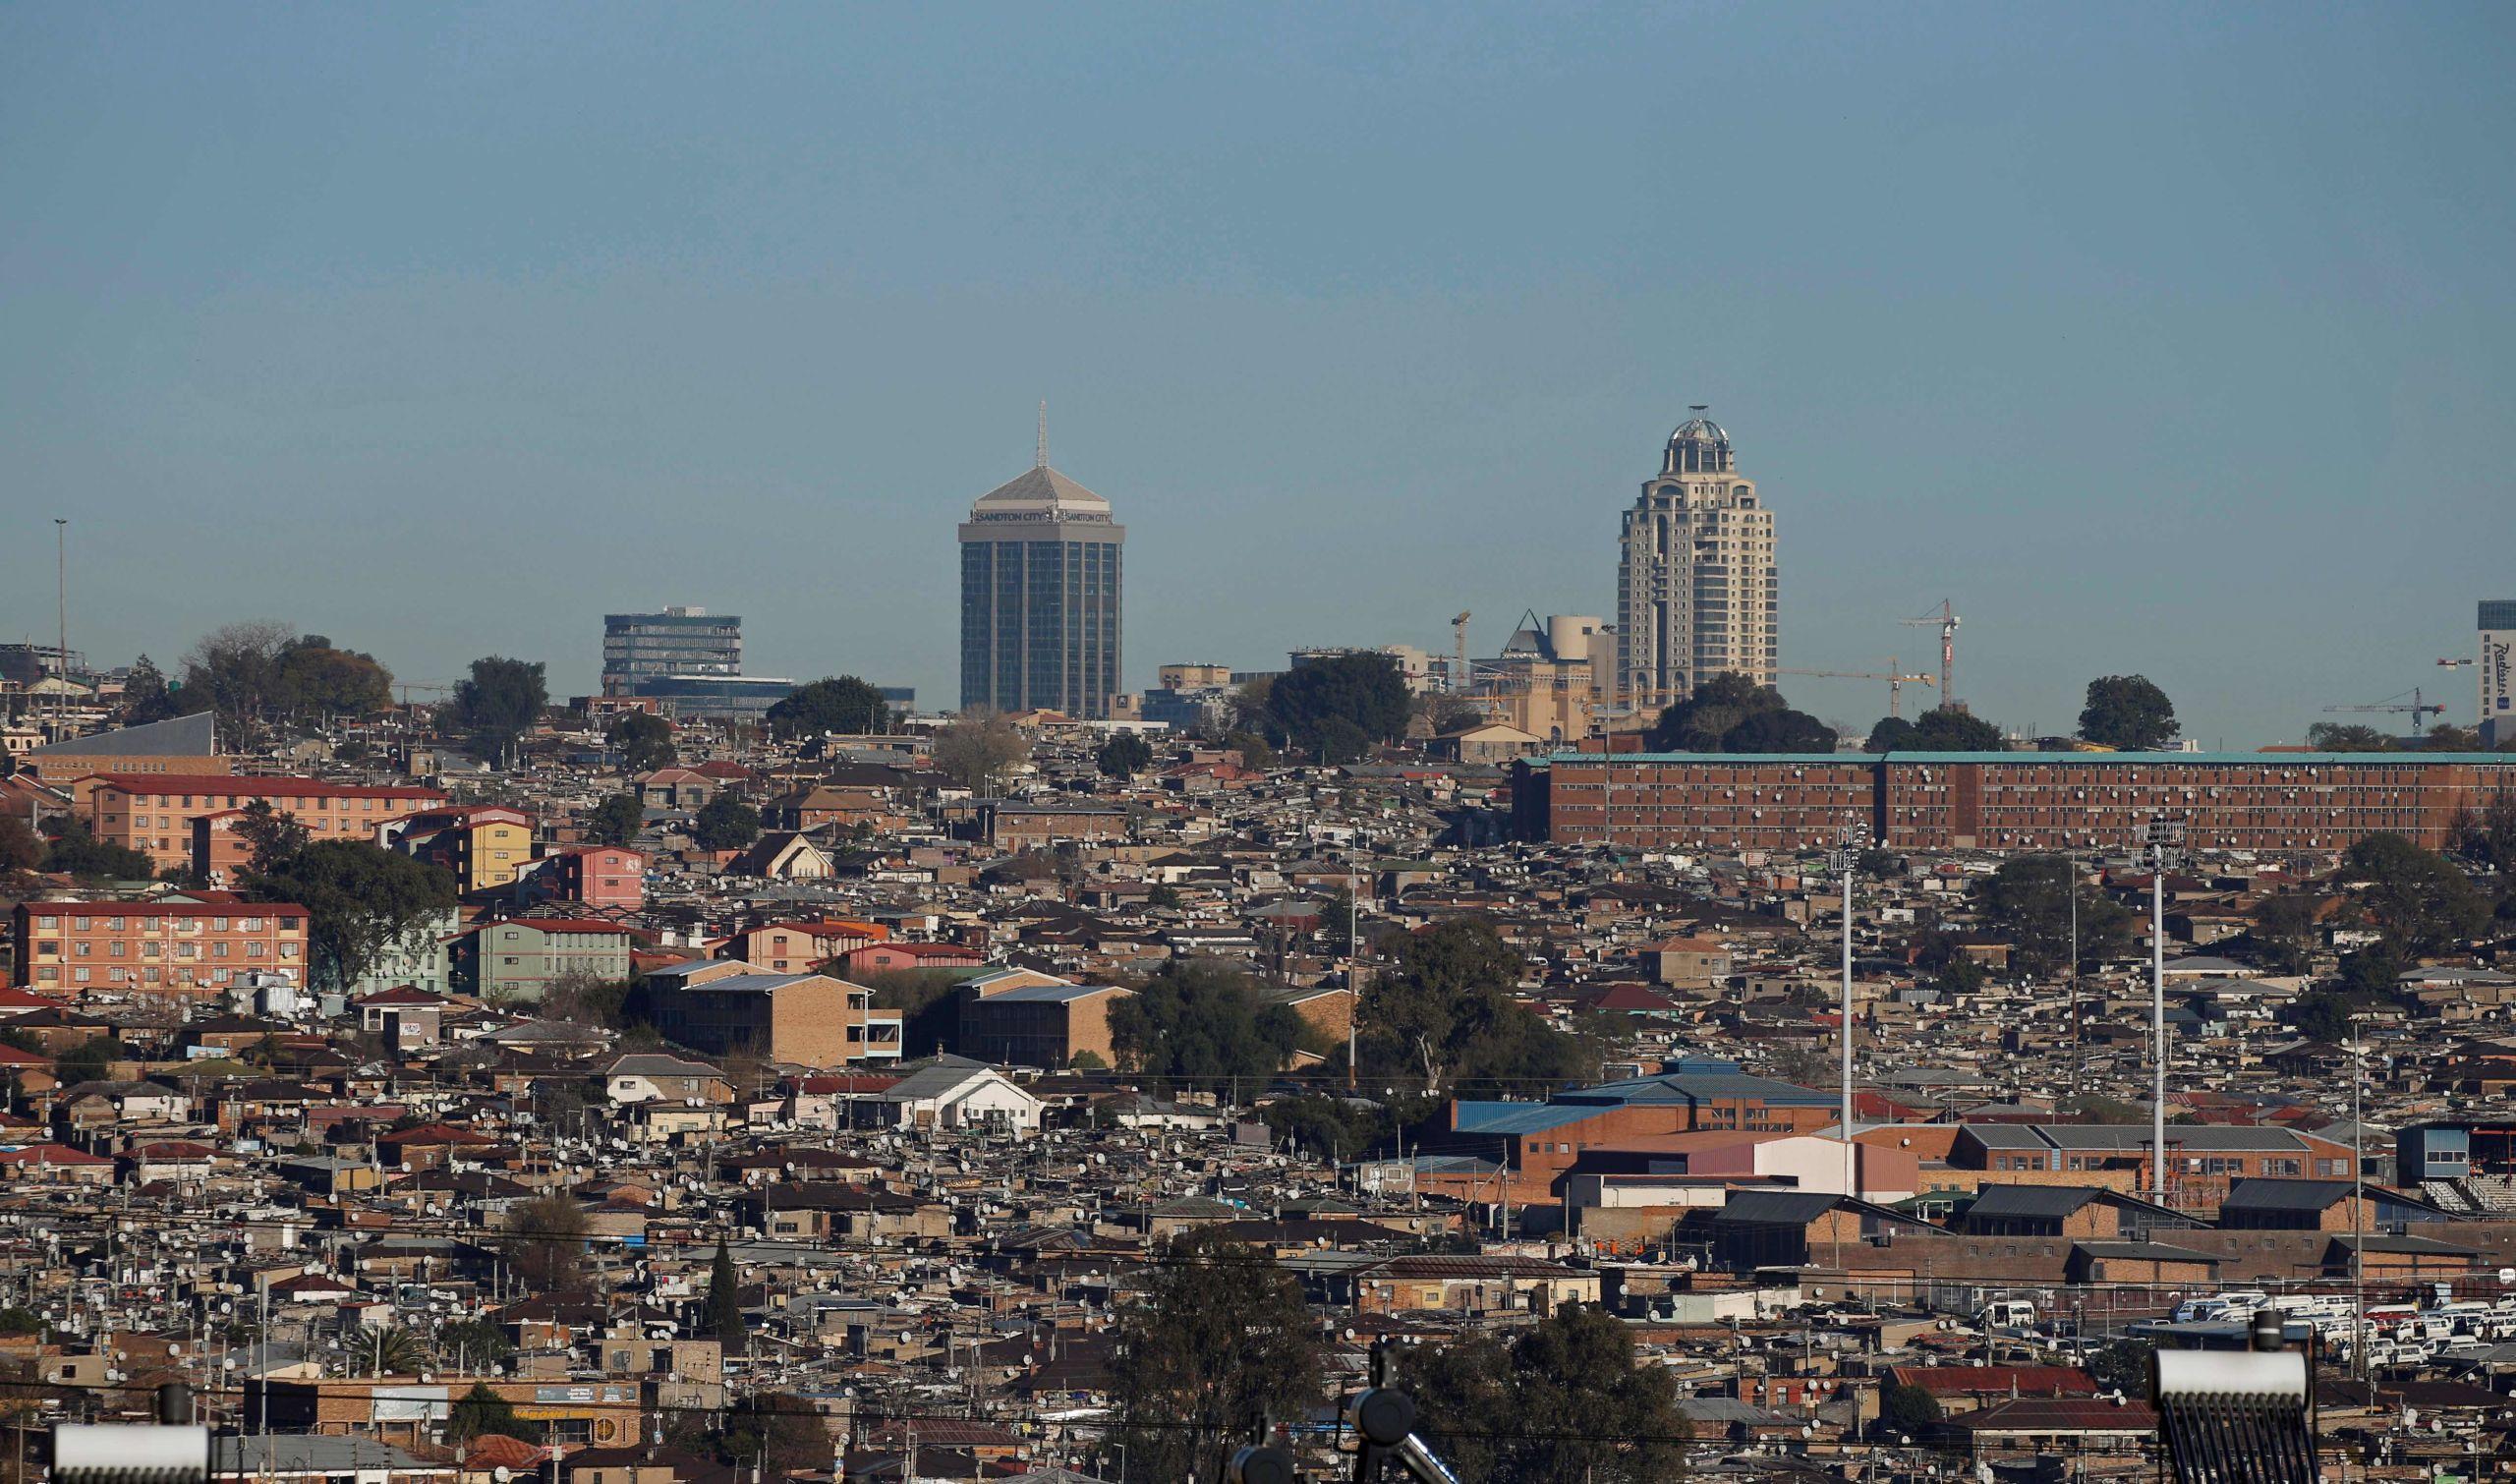 Alexandra Township城市风貌图,该地区是为大量无法获得合适居住地的南非人提供的临时解决方案,位于南非约翰内斯堡富人汇集的Sandton郊区附近,2016年7月28日。路透社Siphiwe Sibeko摄。